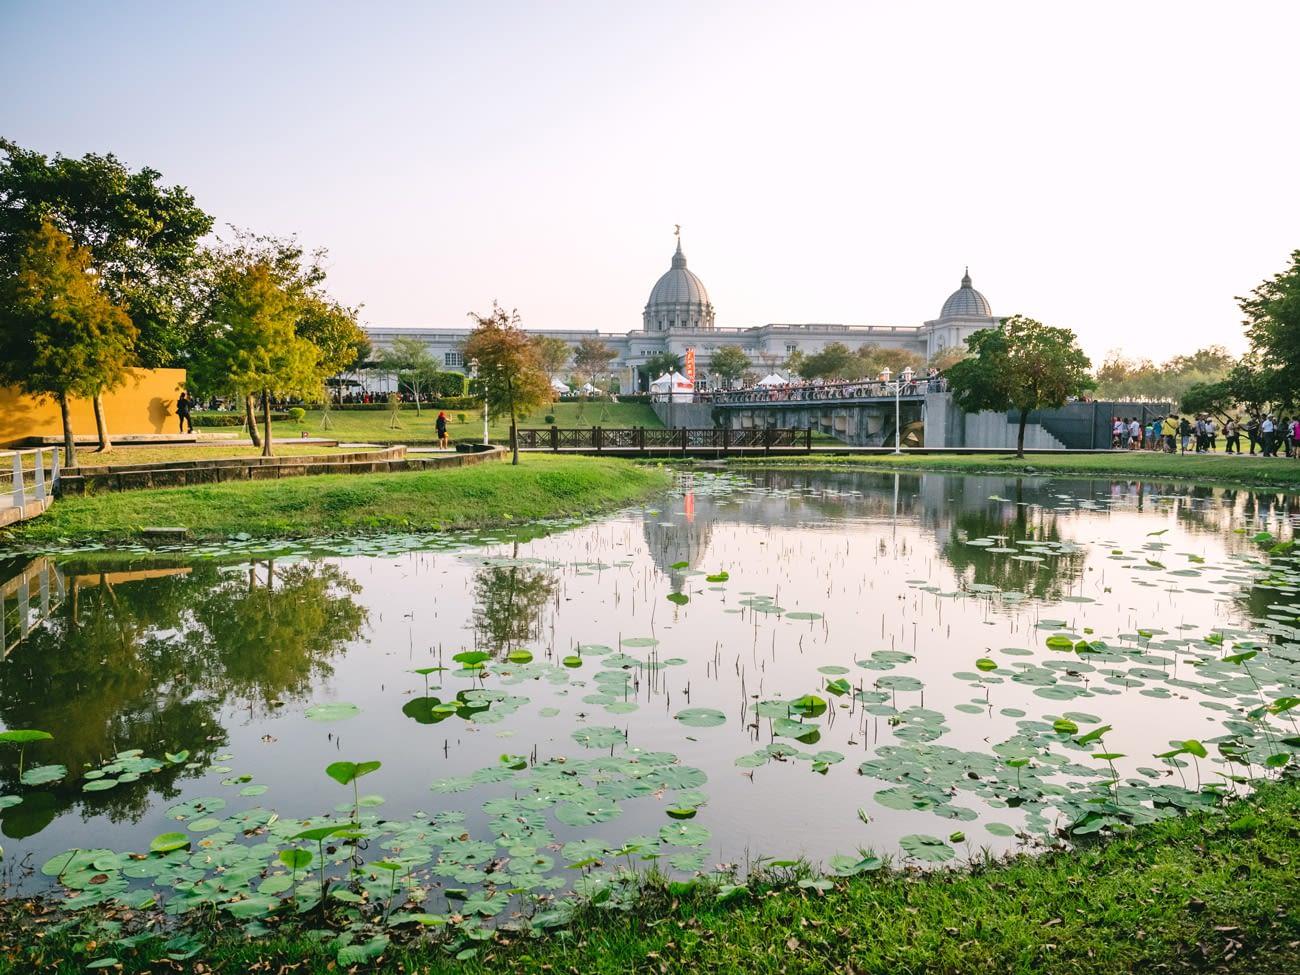 Tainan - Pokemon Go Safari Event - Lake around Chimei museum